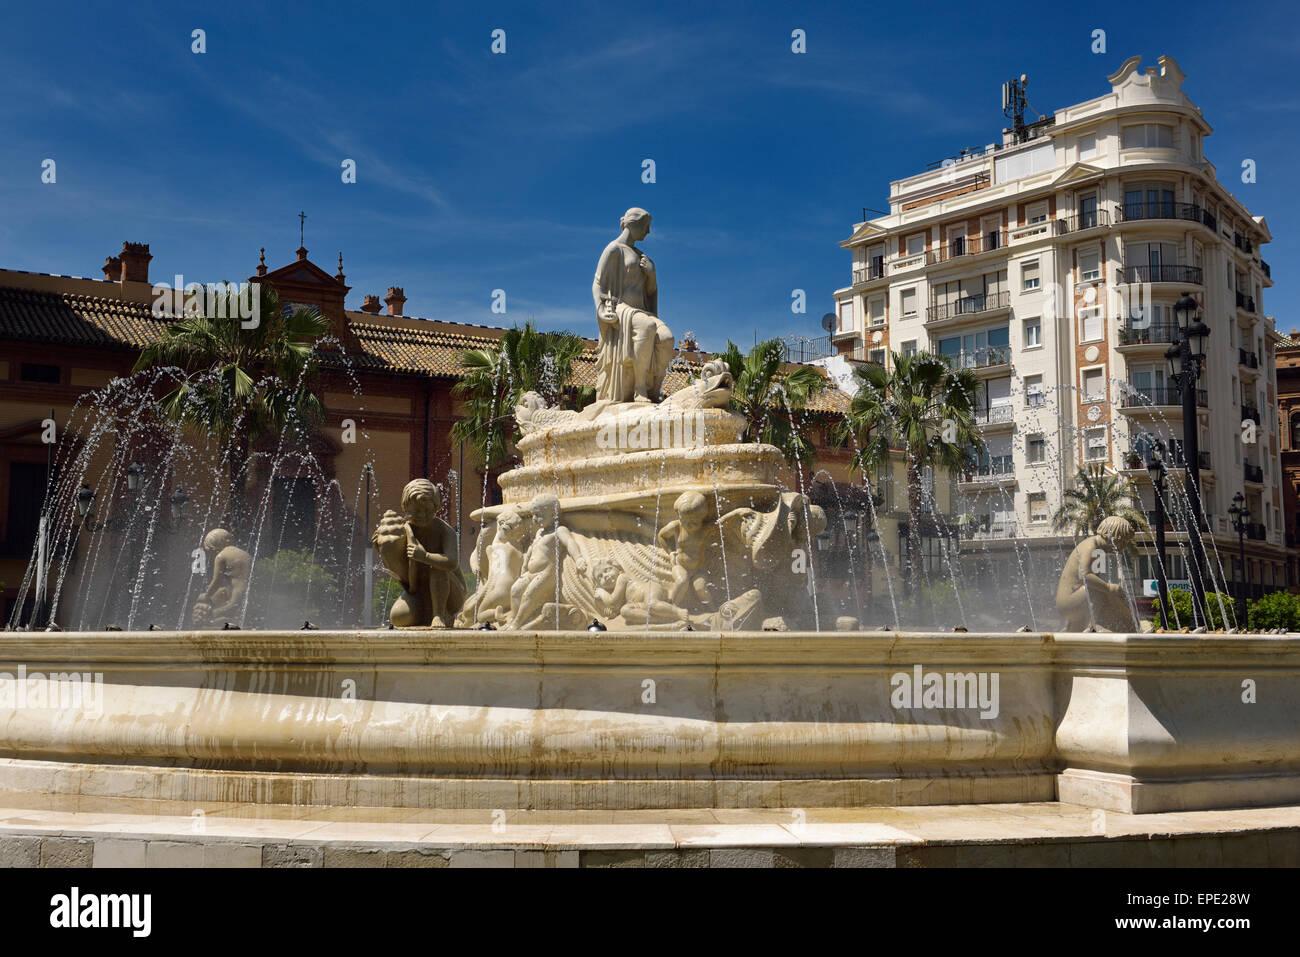 Fontana di acqua di hispalis con nereide ninfe marine a Puerto de Jerez rotatoria a siviglia spagna Foto Stock